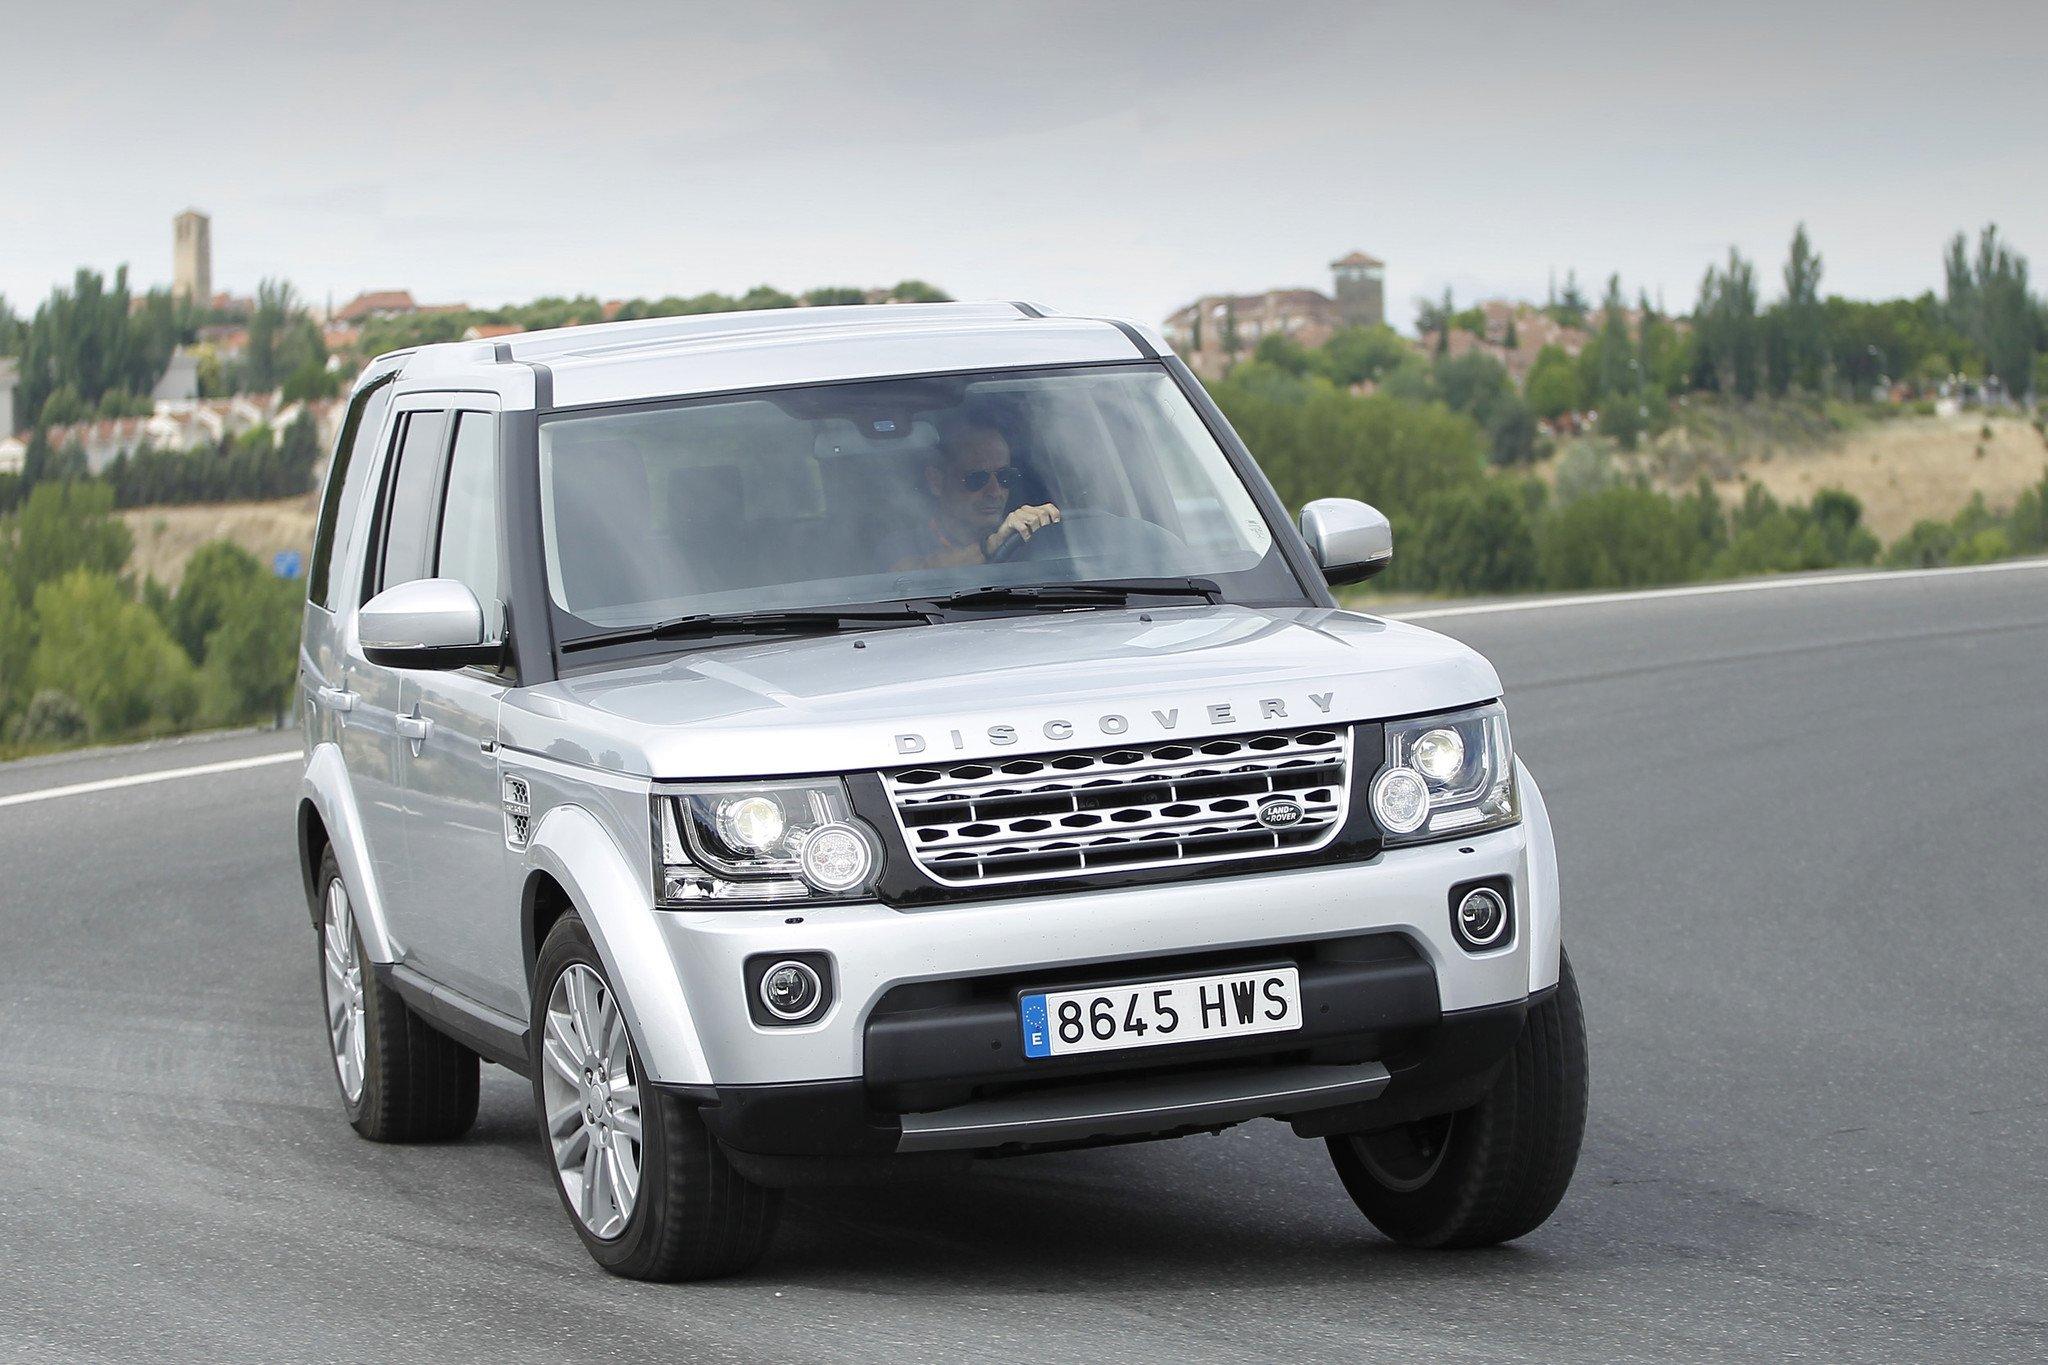 Land Rover Discovery 3.0 SDV6